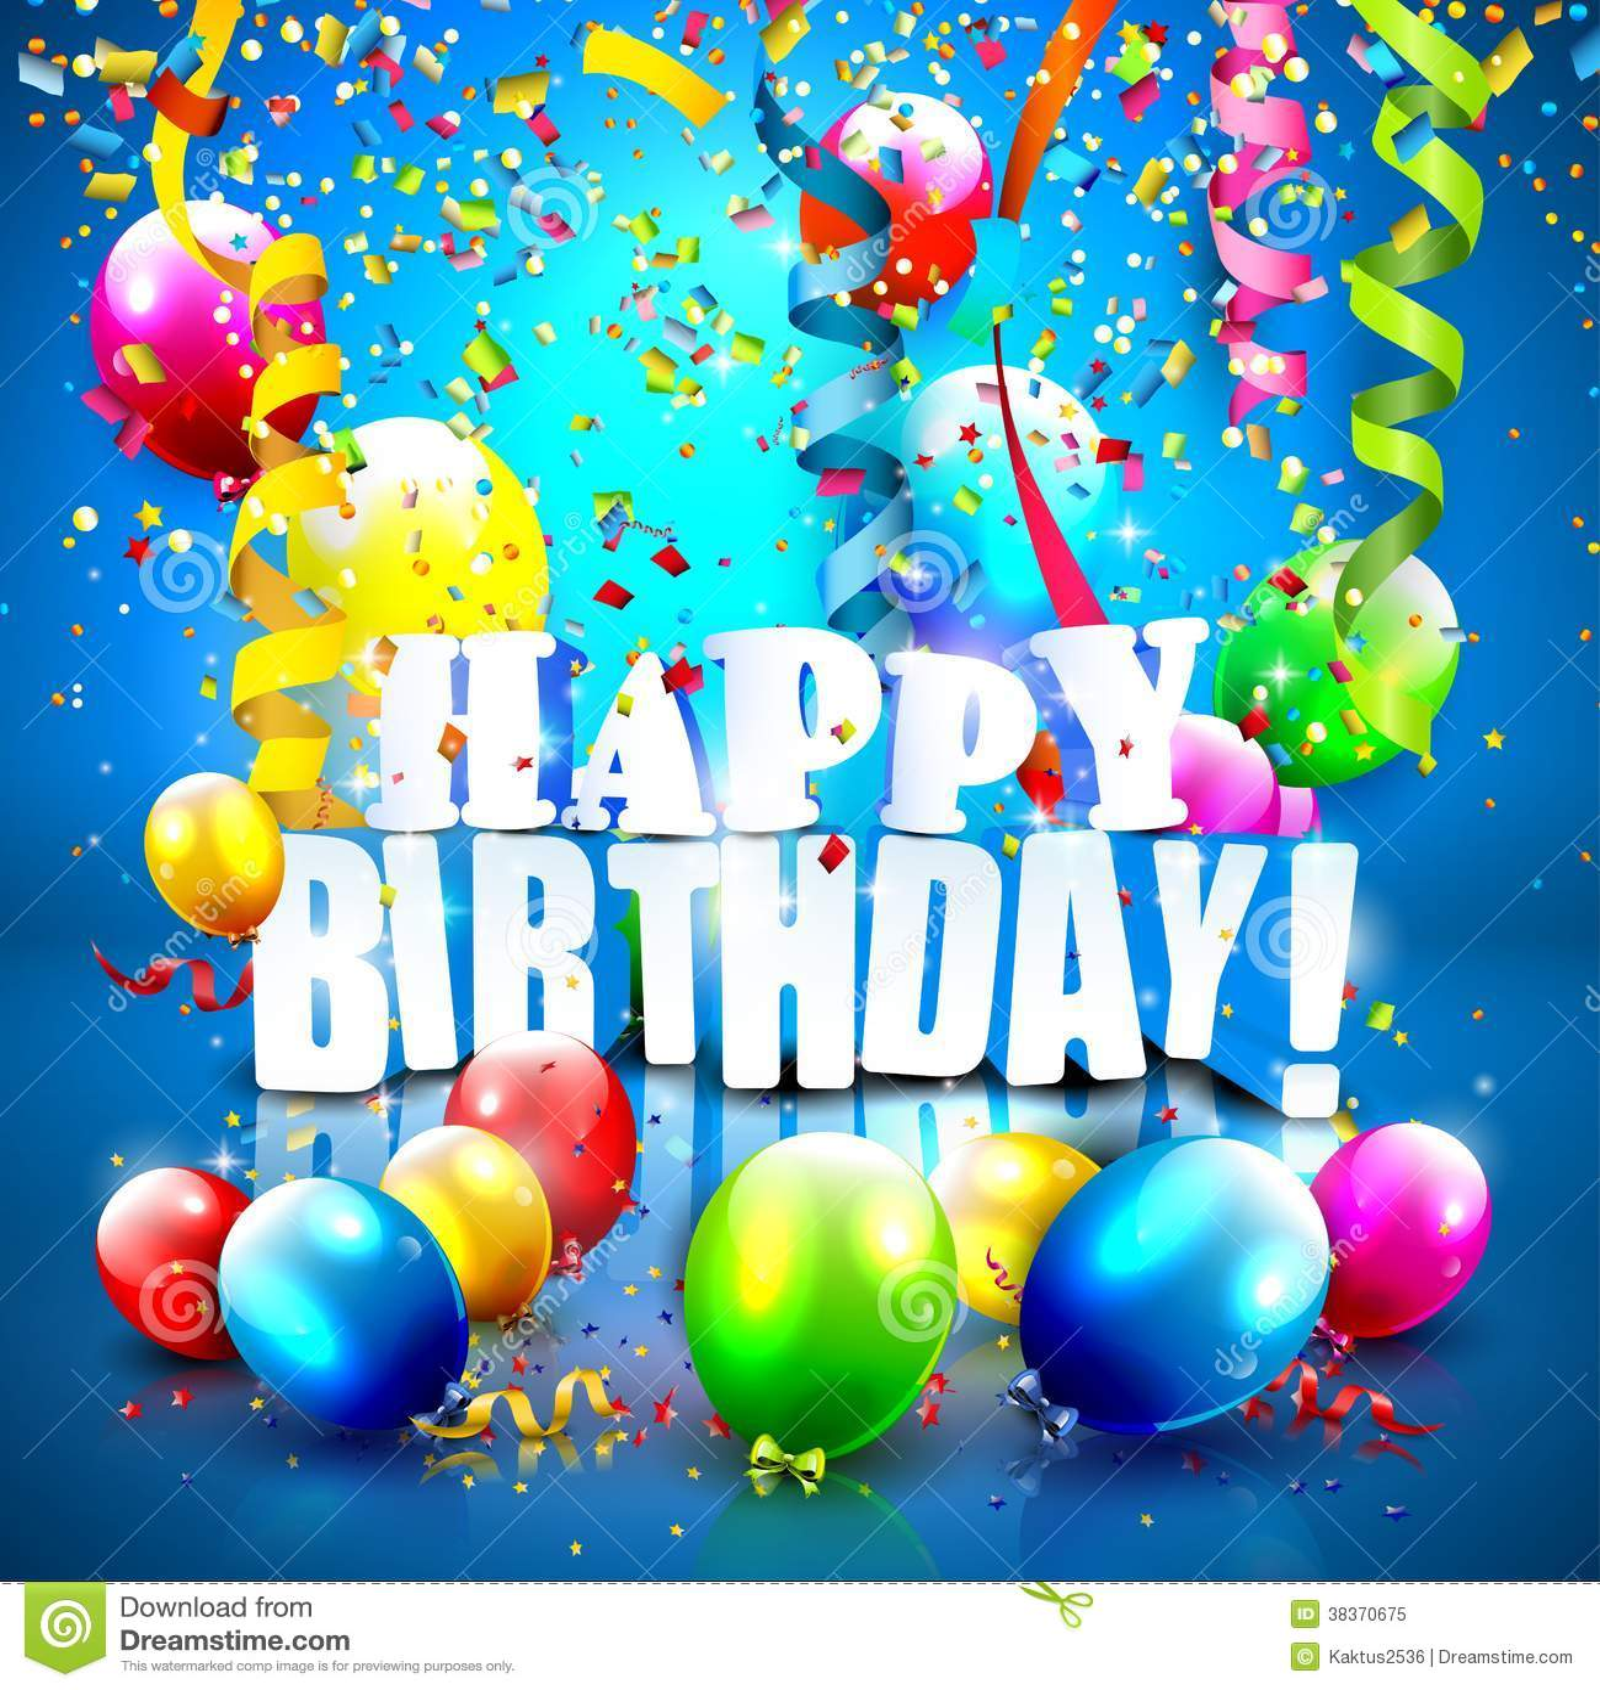 Royalty Free Birthday Images ~ Birthday background royalty free stock photo image